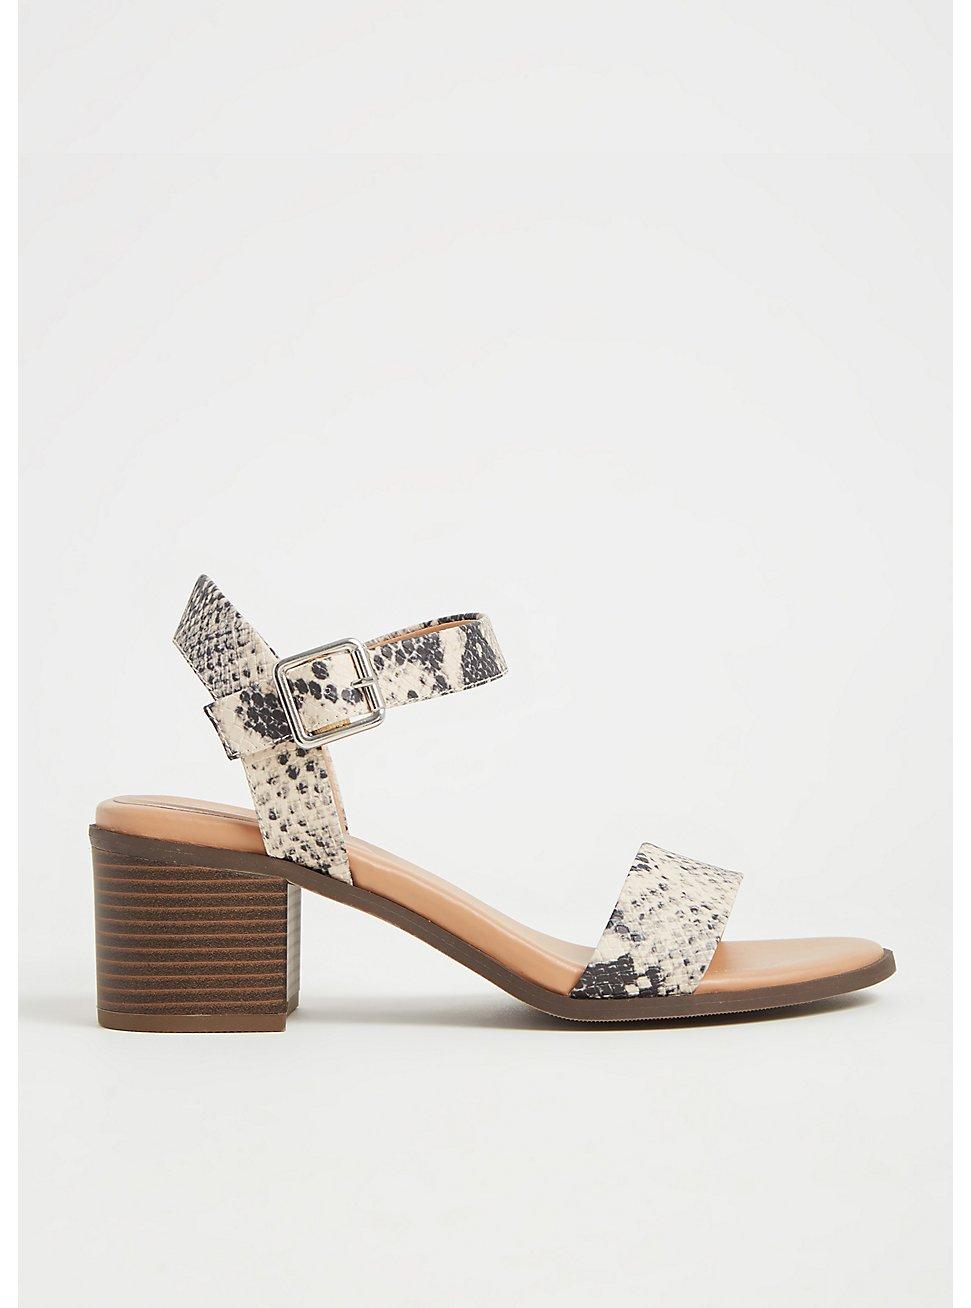 Plus Size Snakeskin Print Faux Leather Ankle Strap Heel (WW), ANIMAL, hi-res